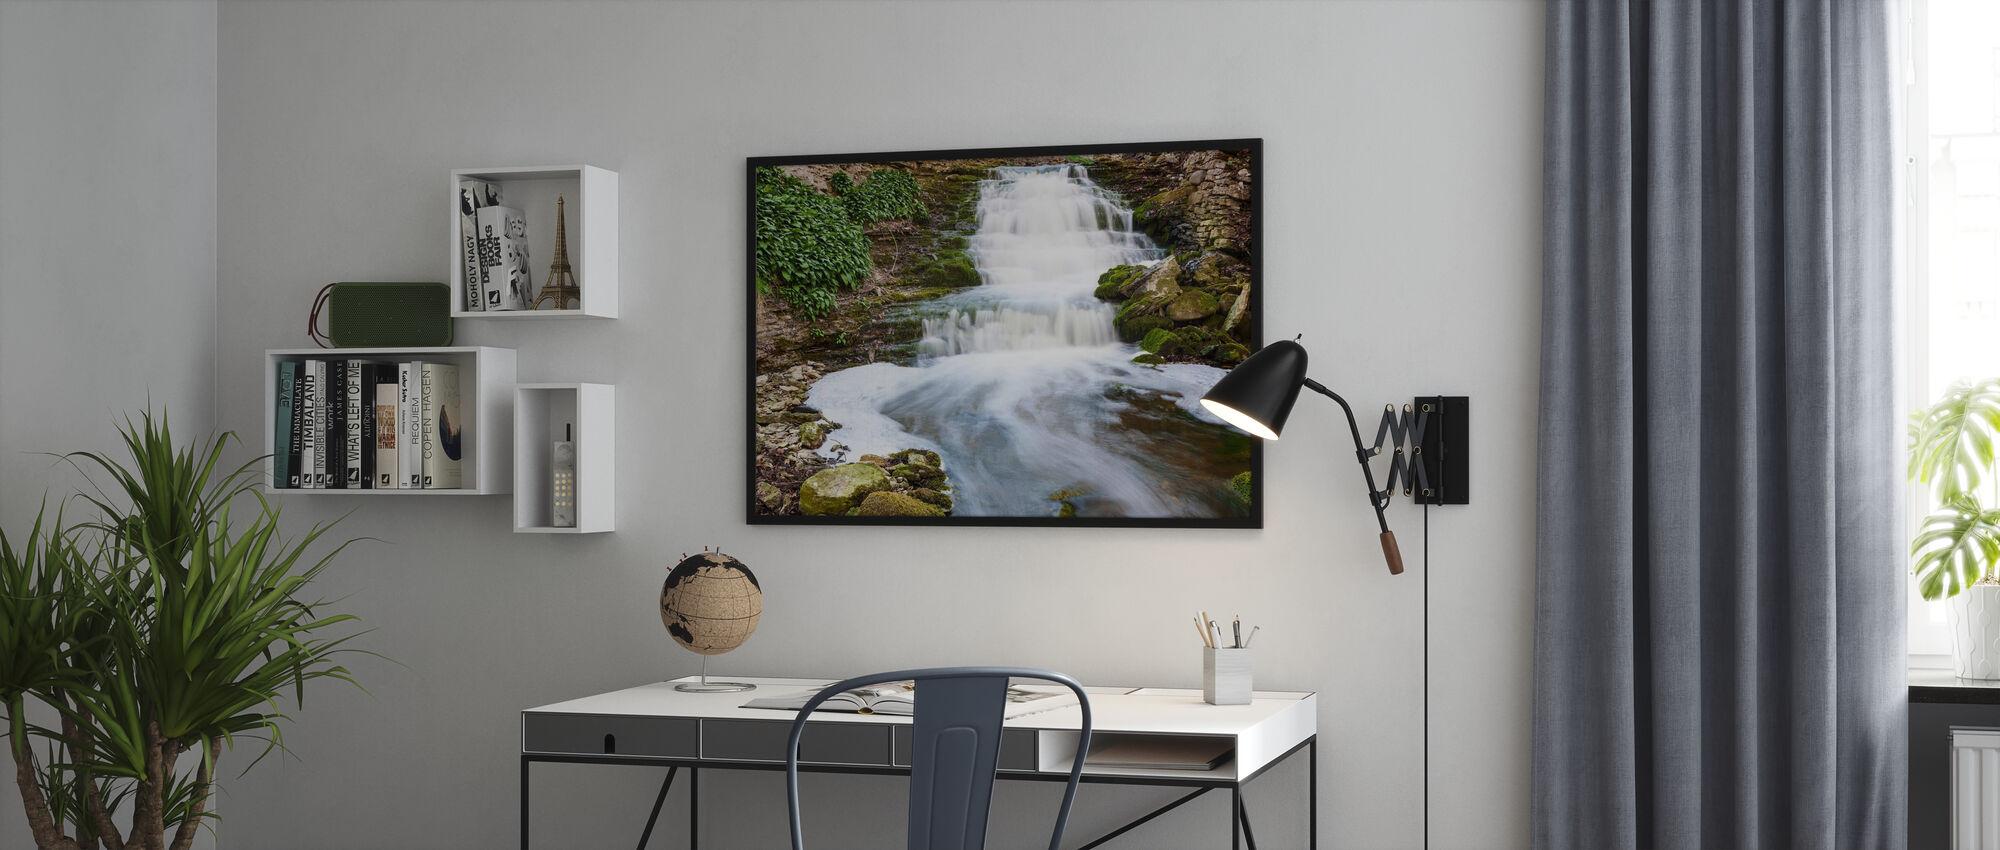 Fluss Gotland - Poster - Büro